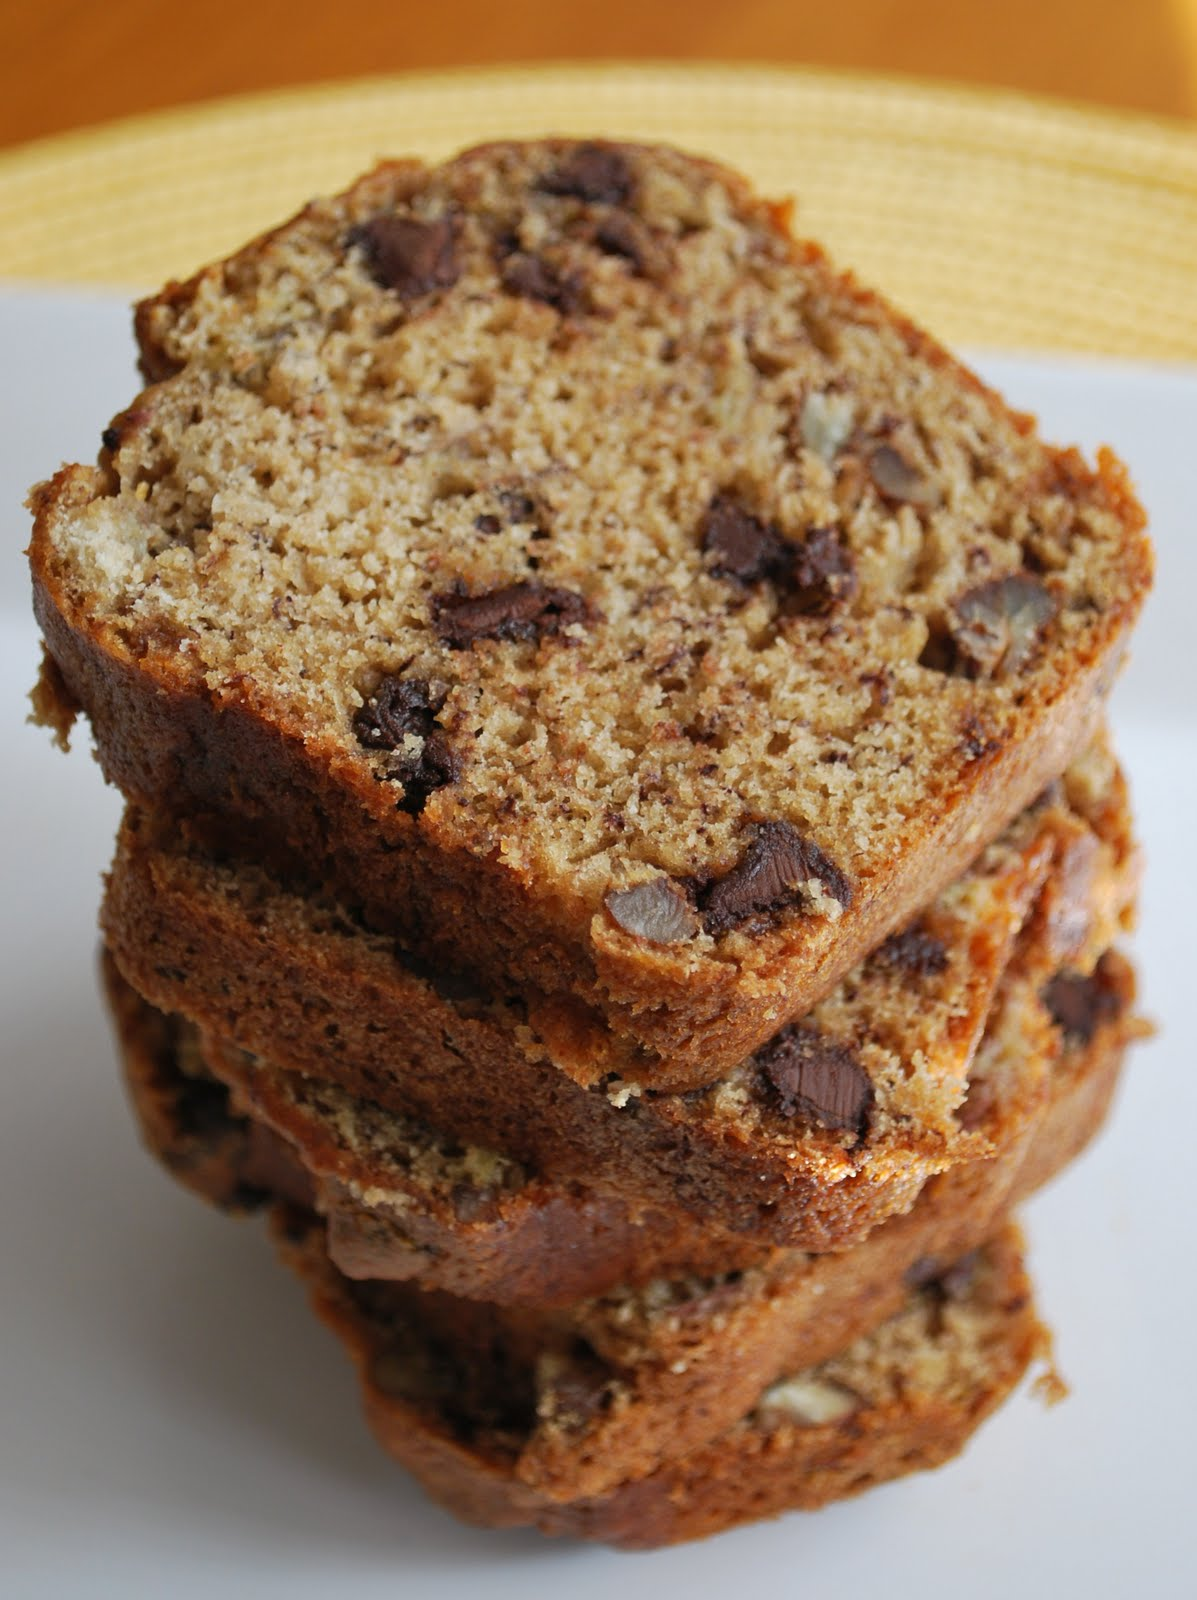 The Capitol Baker: Chocolate Chip Banana Bread